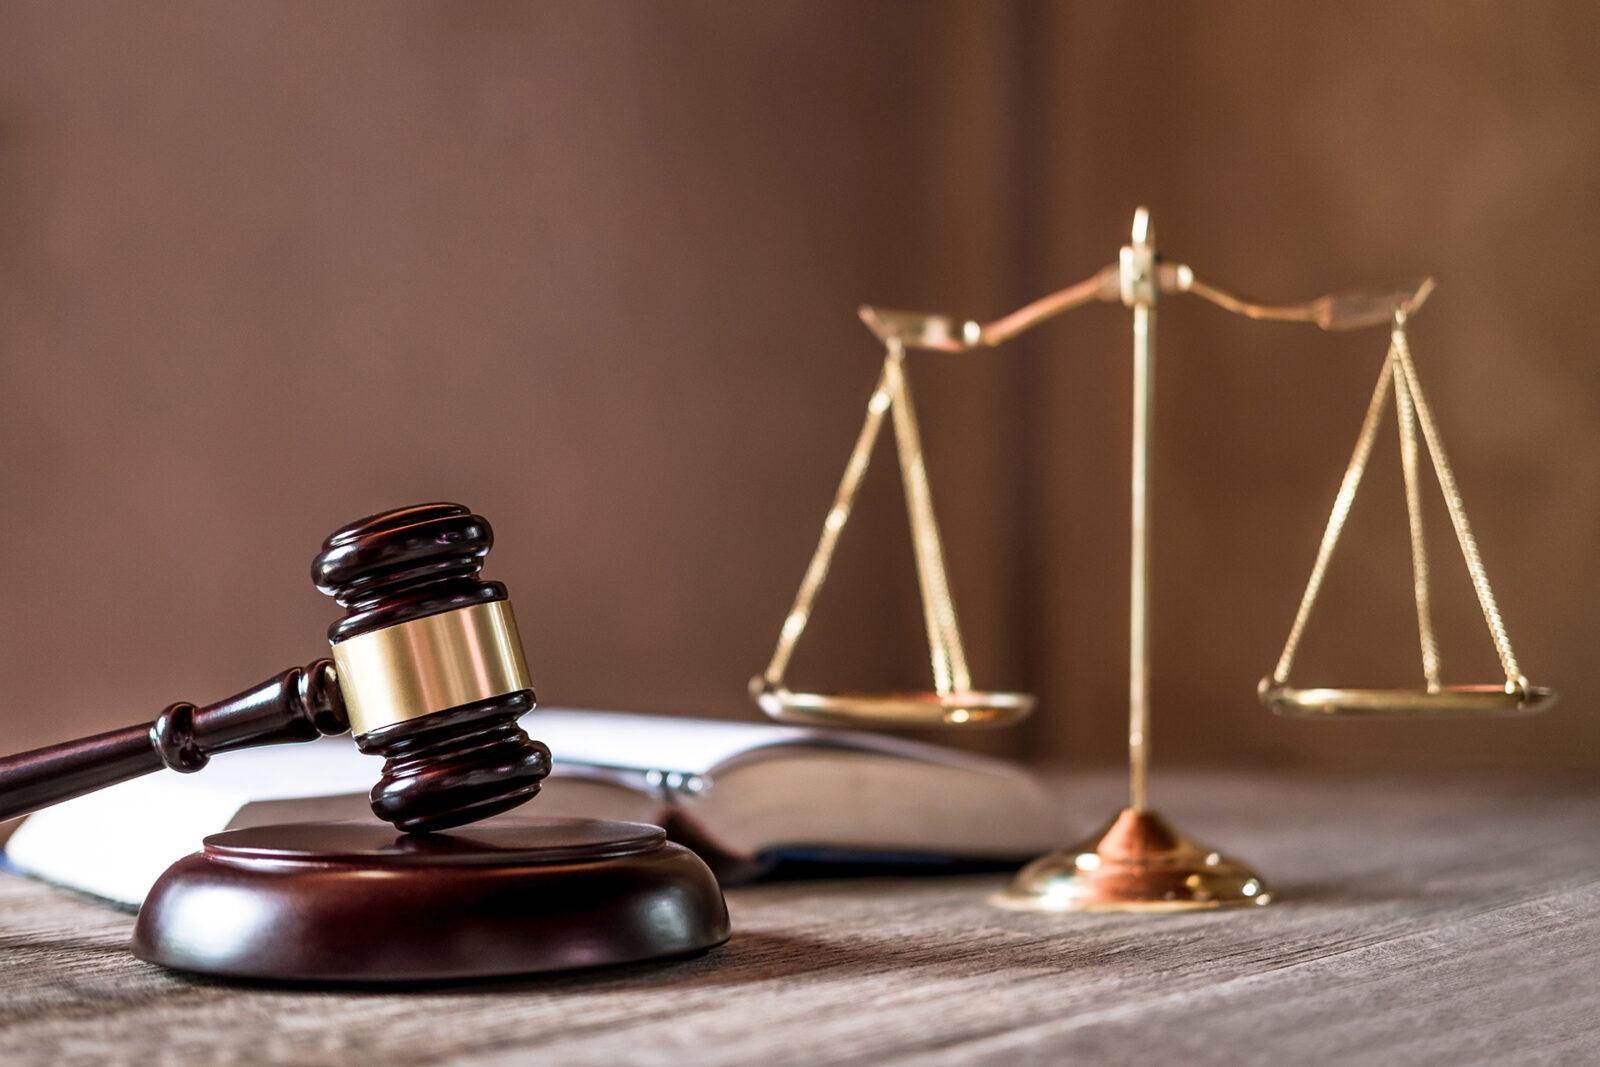 BPS Law LLP